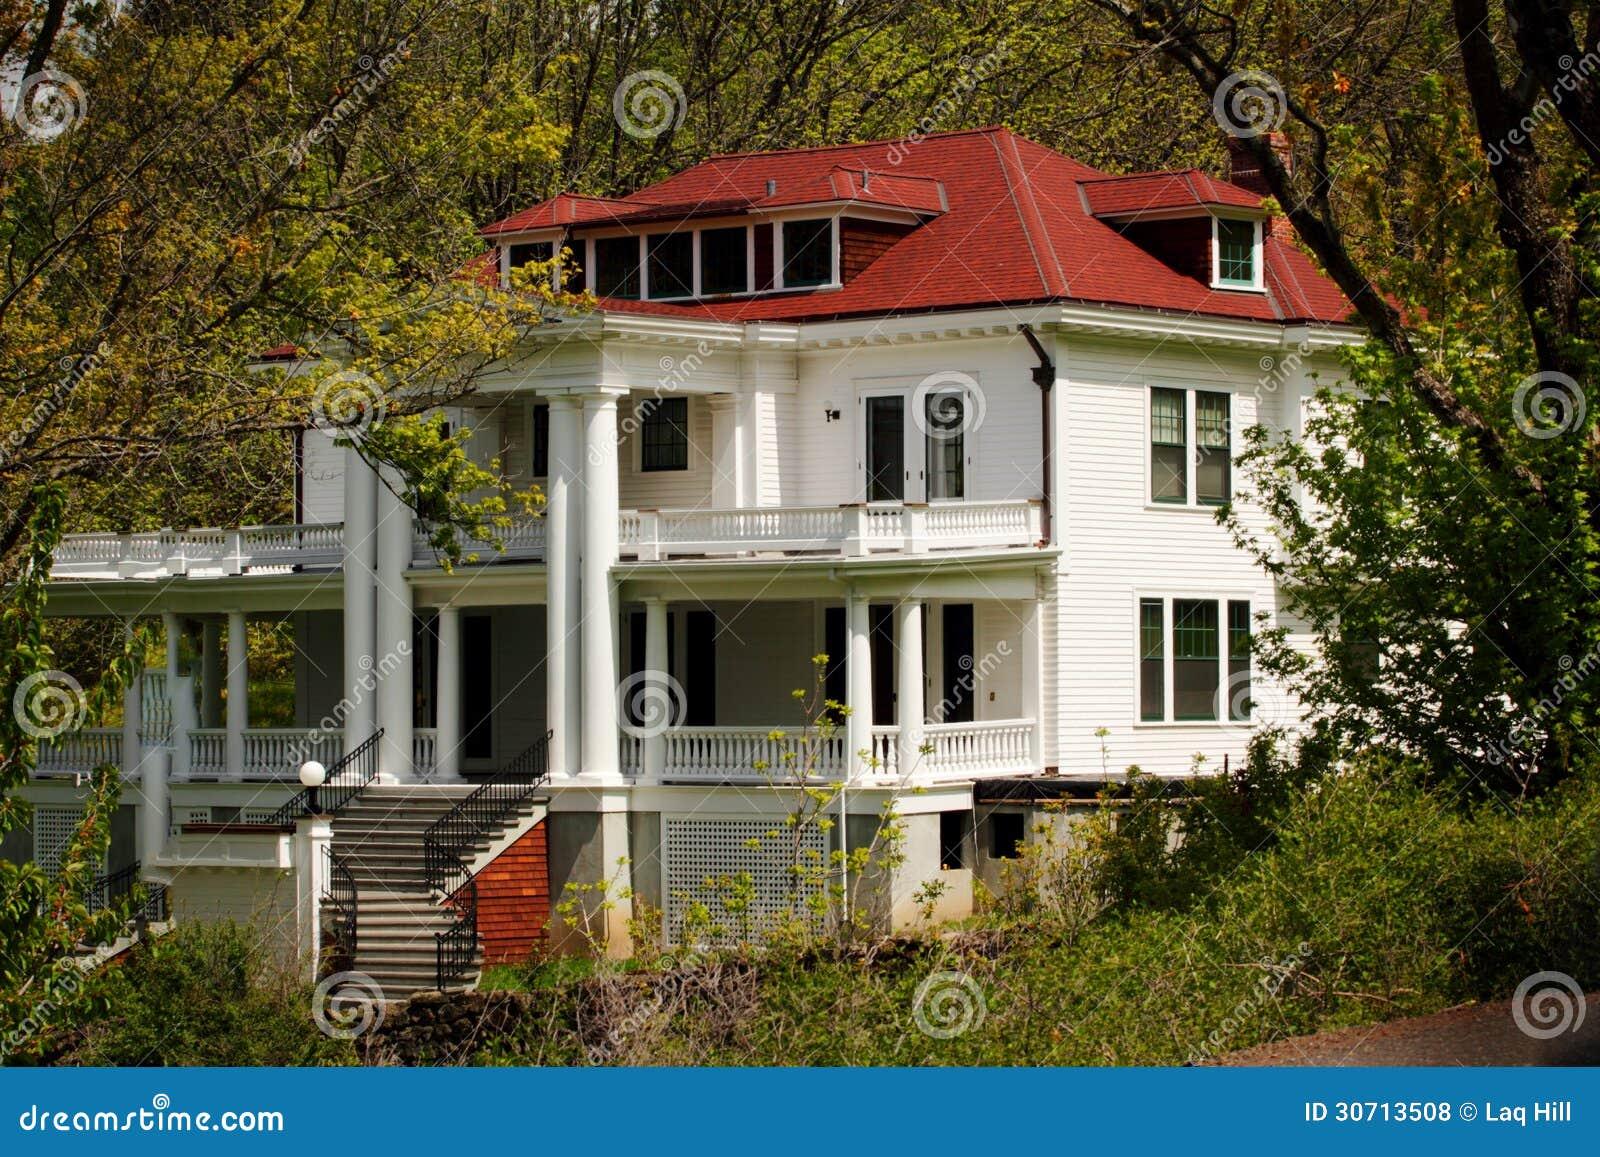 Home Farm House Plans With Front Porch on craftsman house plans with front porch, farm house porches, cape cod house plans with front porch, country porch, farm house building plans, narrow lot house plans with front porch,